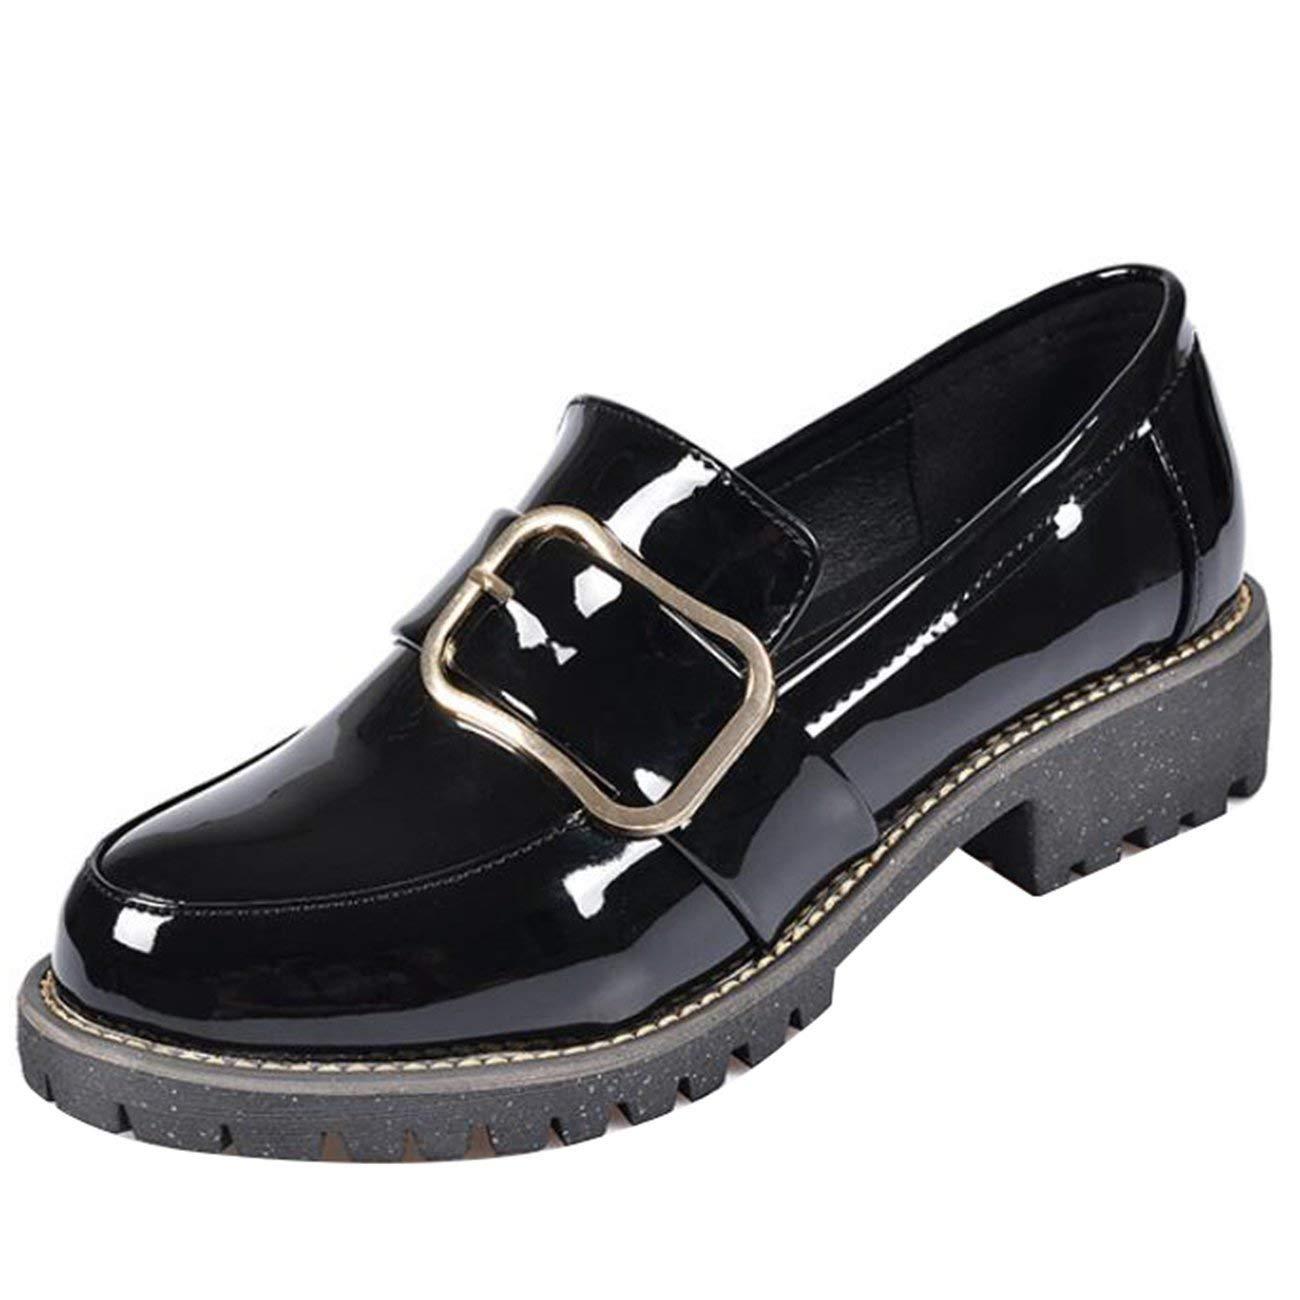 Fuxitoggo Damen Runde Toe Block-Heel Block-Heel Block-Heel Slip-On Metall Loafers (Farbe   Schwarz Größe   4 UK) 7bba20